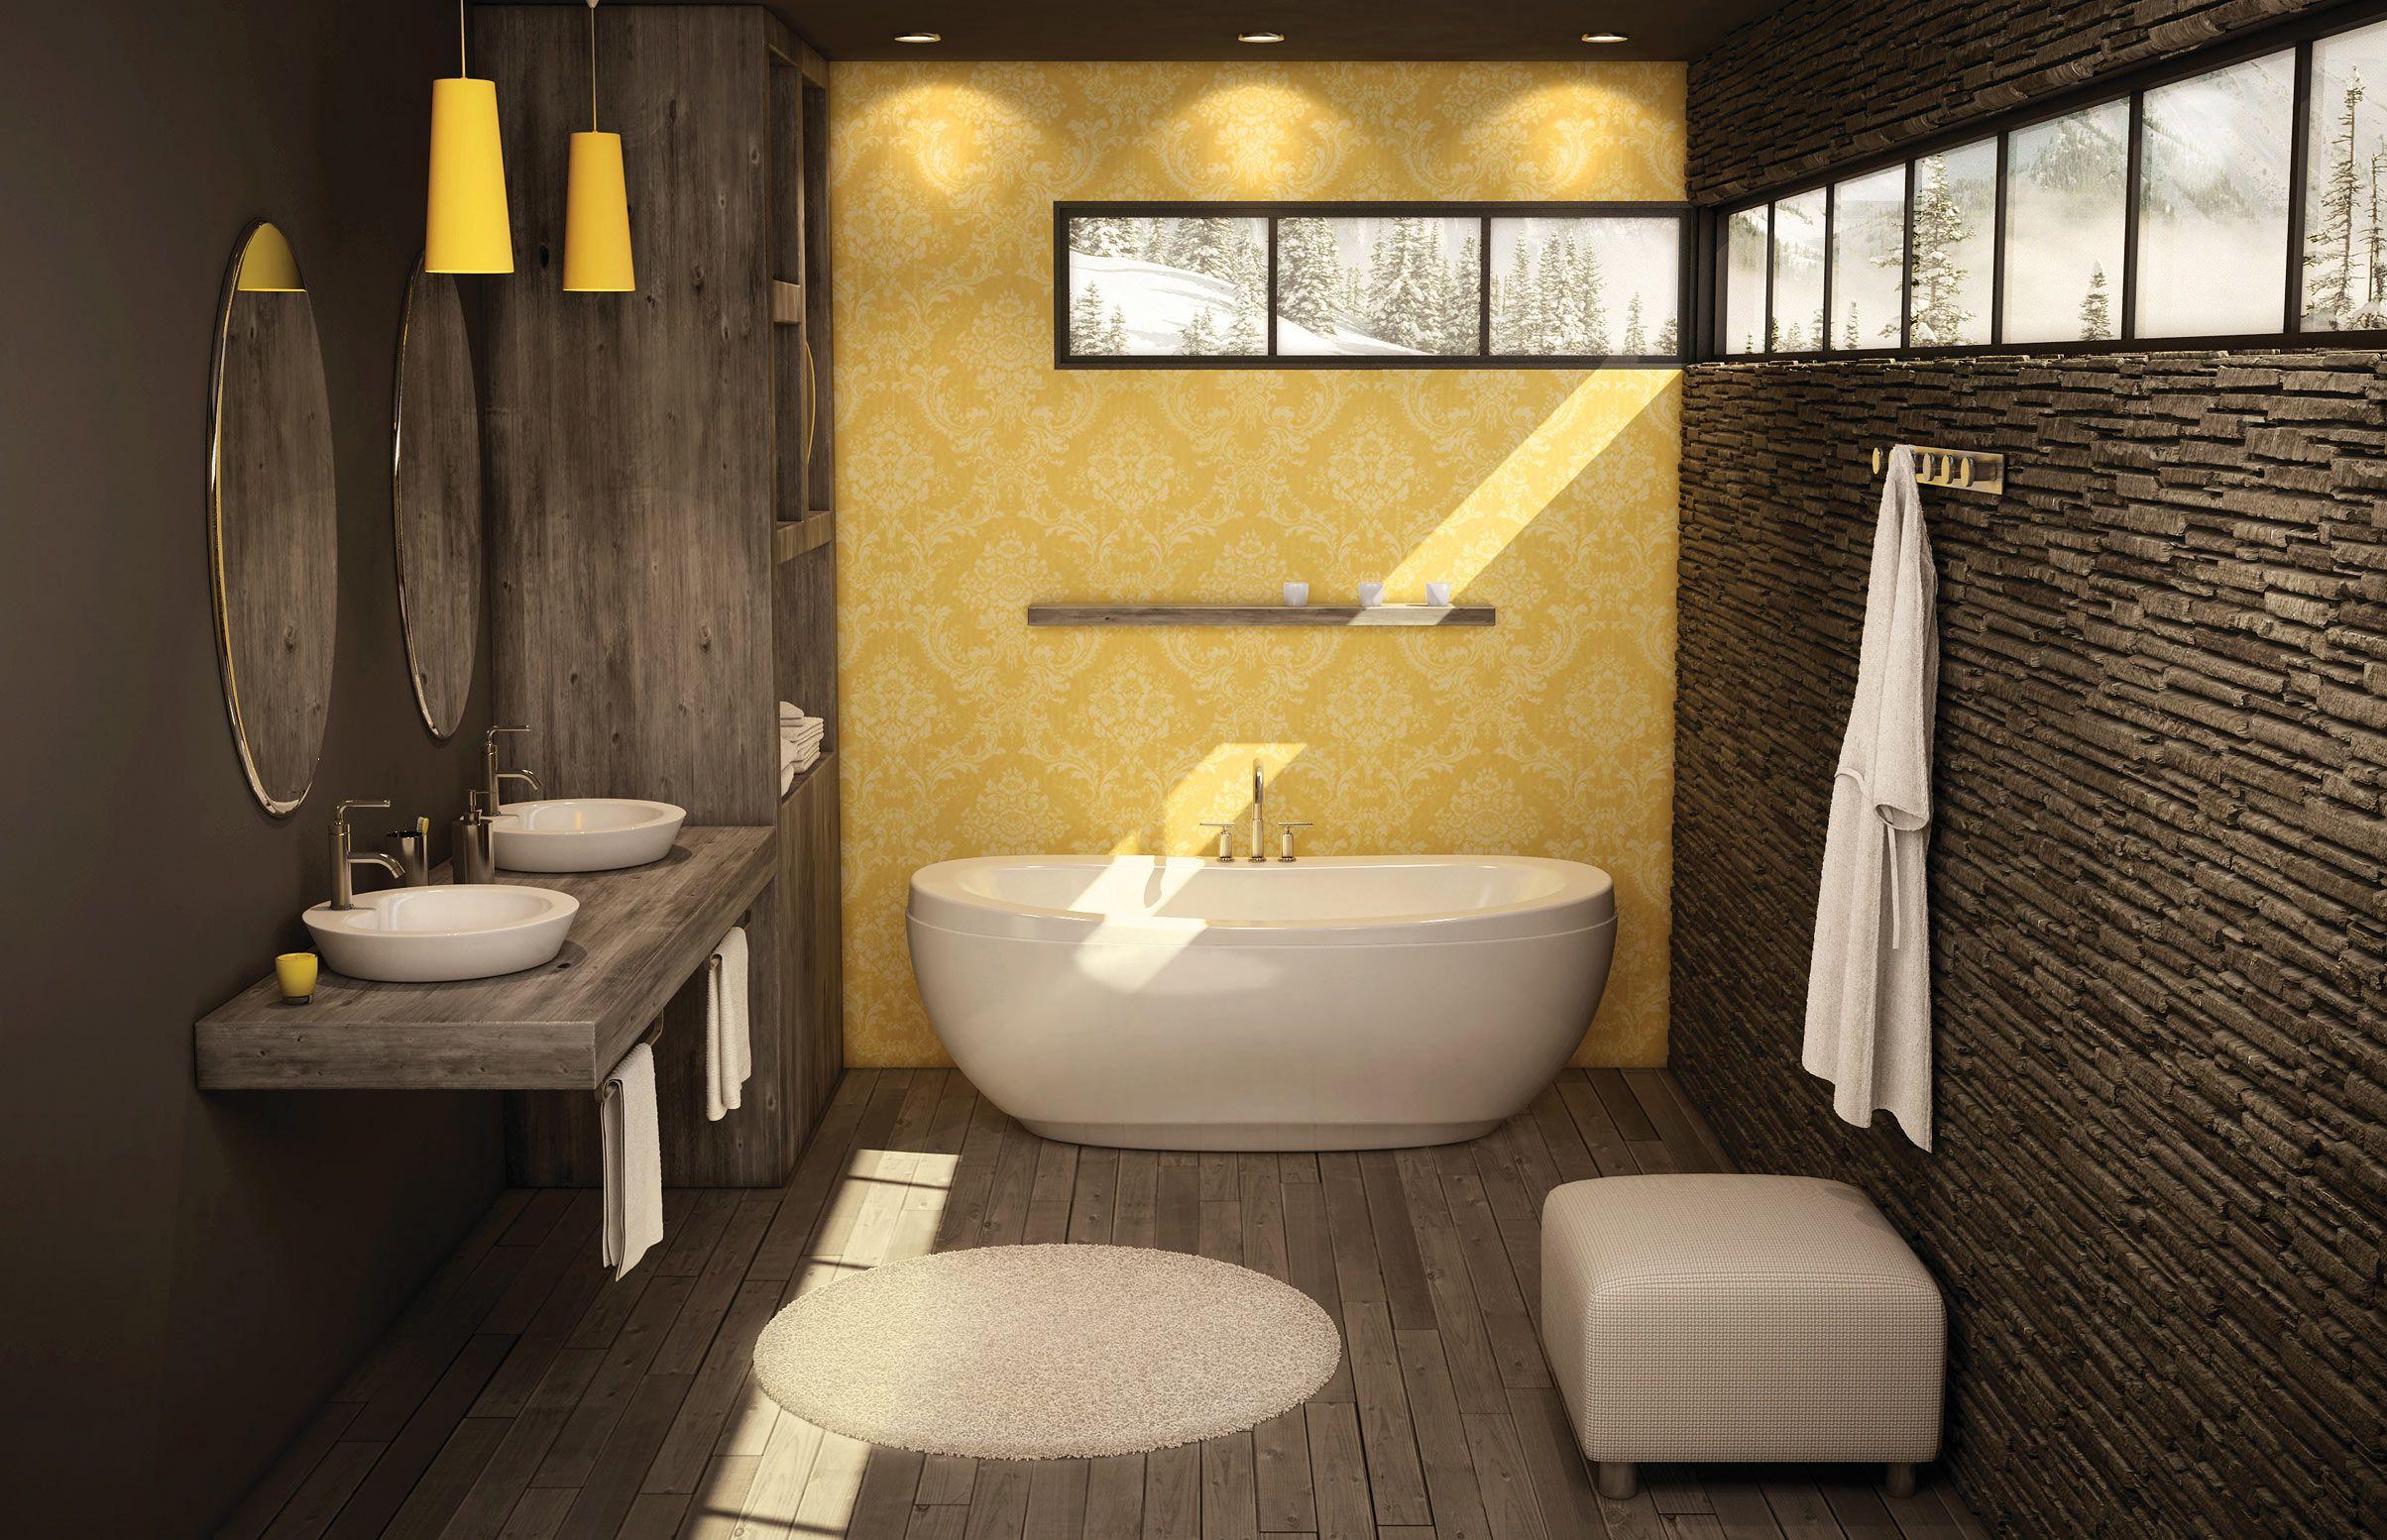 Axial Duo Tub Shield 42 x 58 in. 8 mm | Bathtubs, Bathroom designs ...